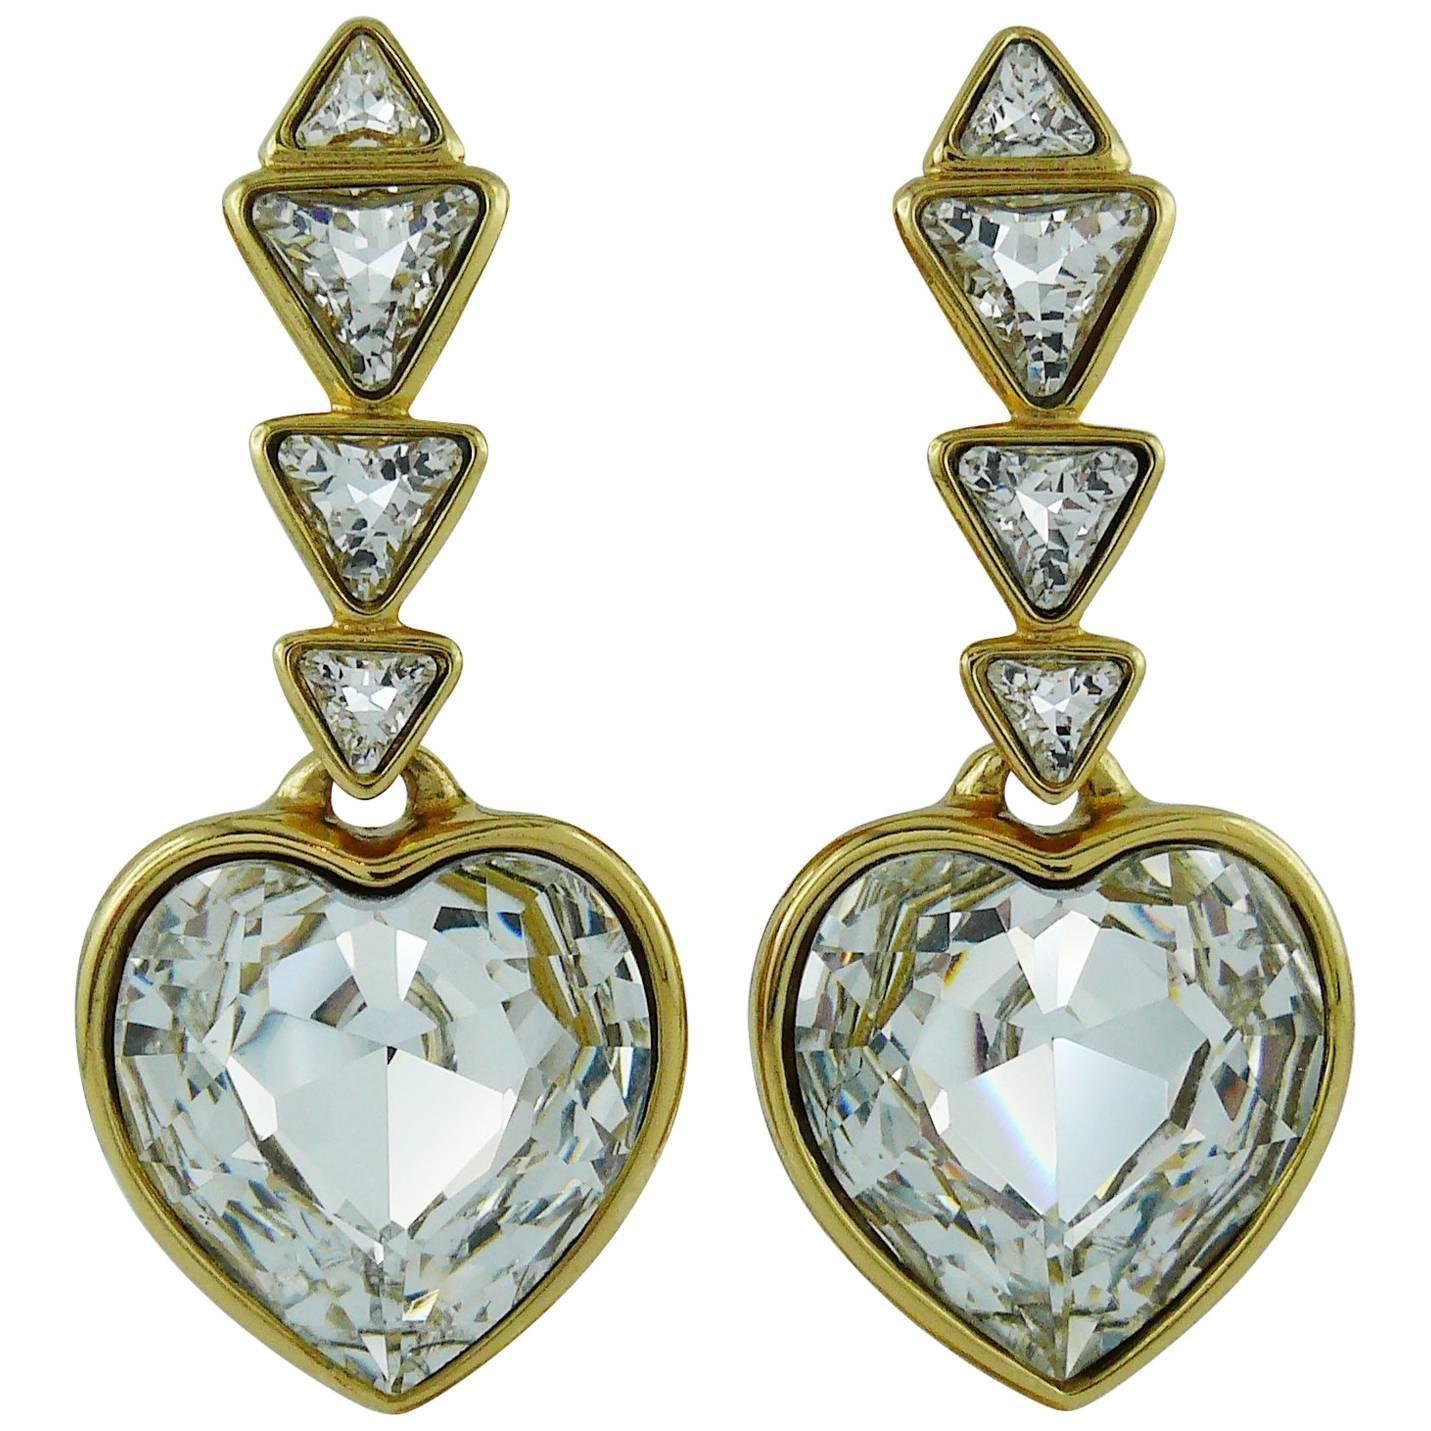 4badfadc8ca Yves Saint Laurent YSL Vintage Massive Diamante Heart Dangling Earrings